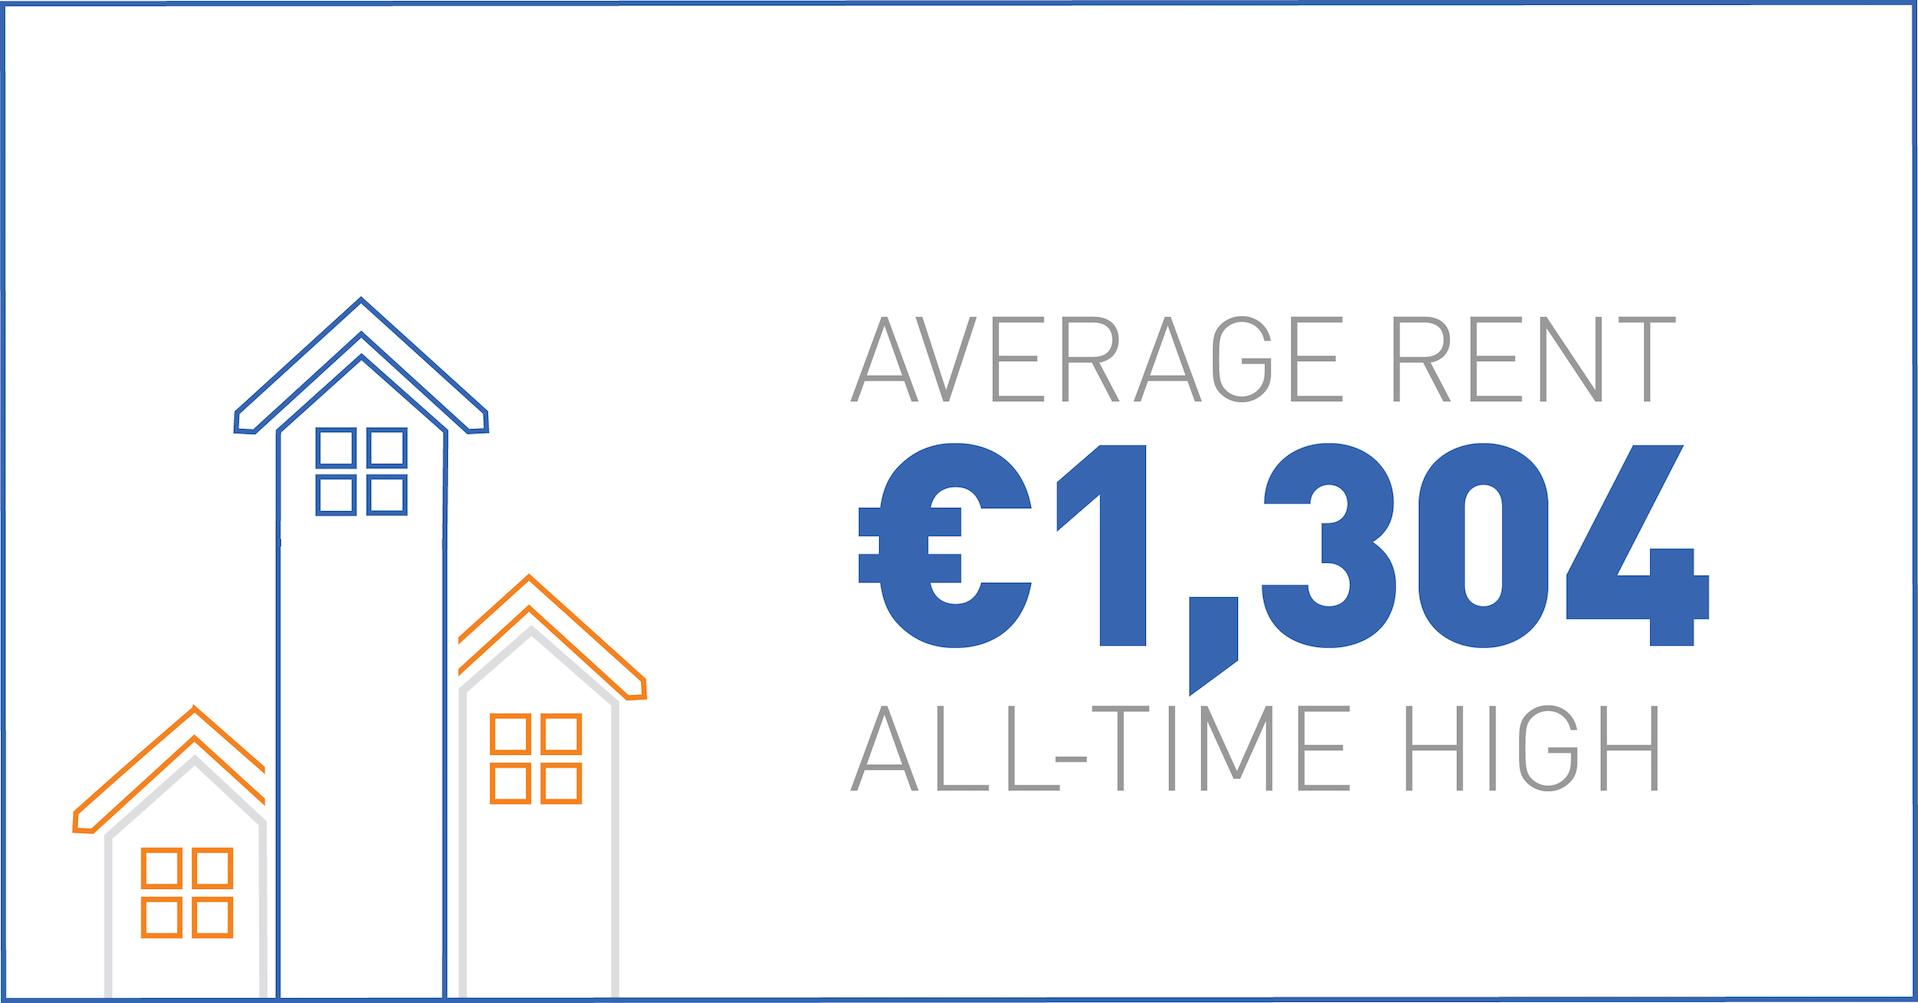 Average rental price - all time high